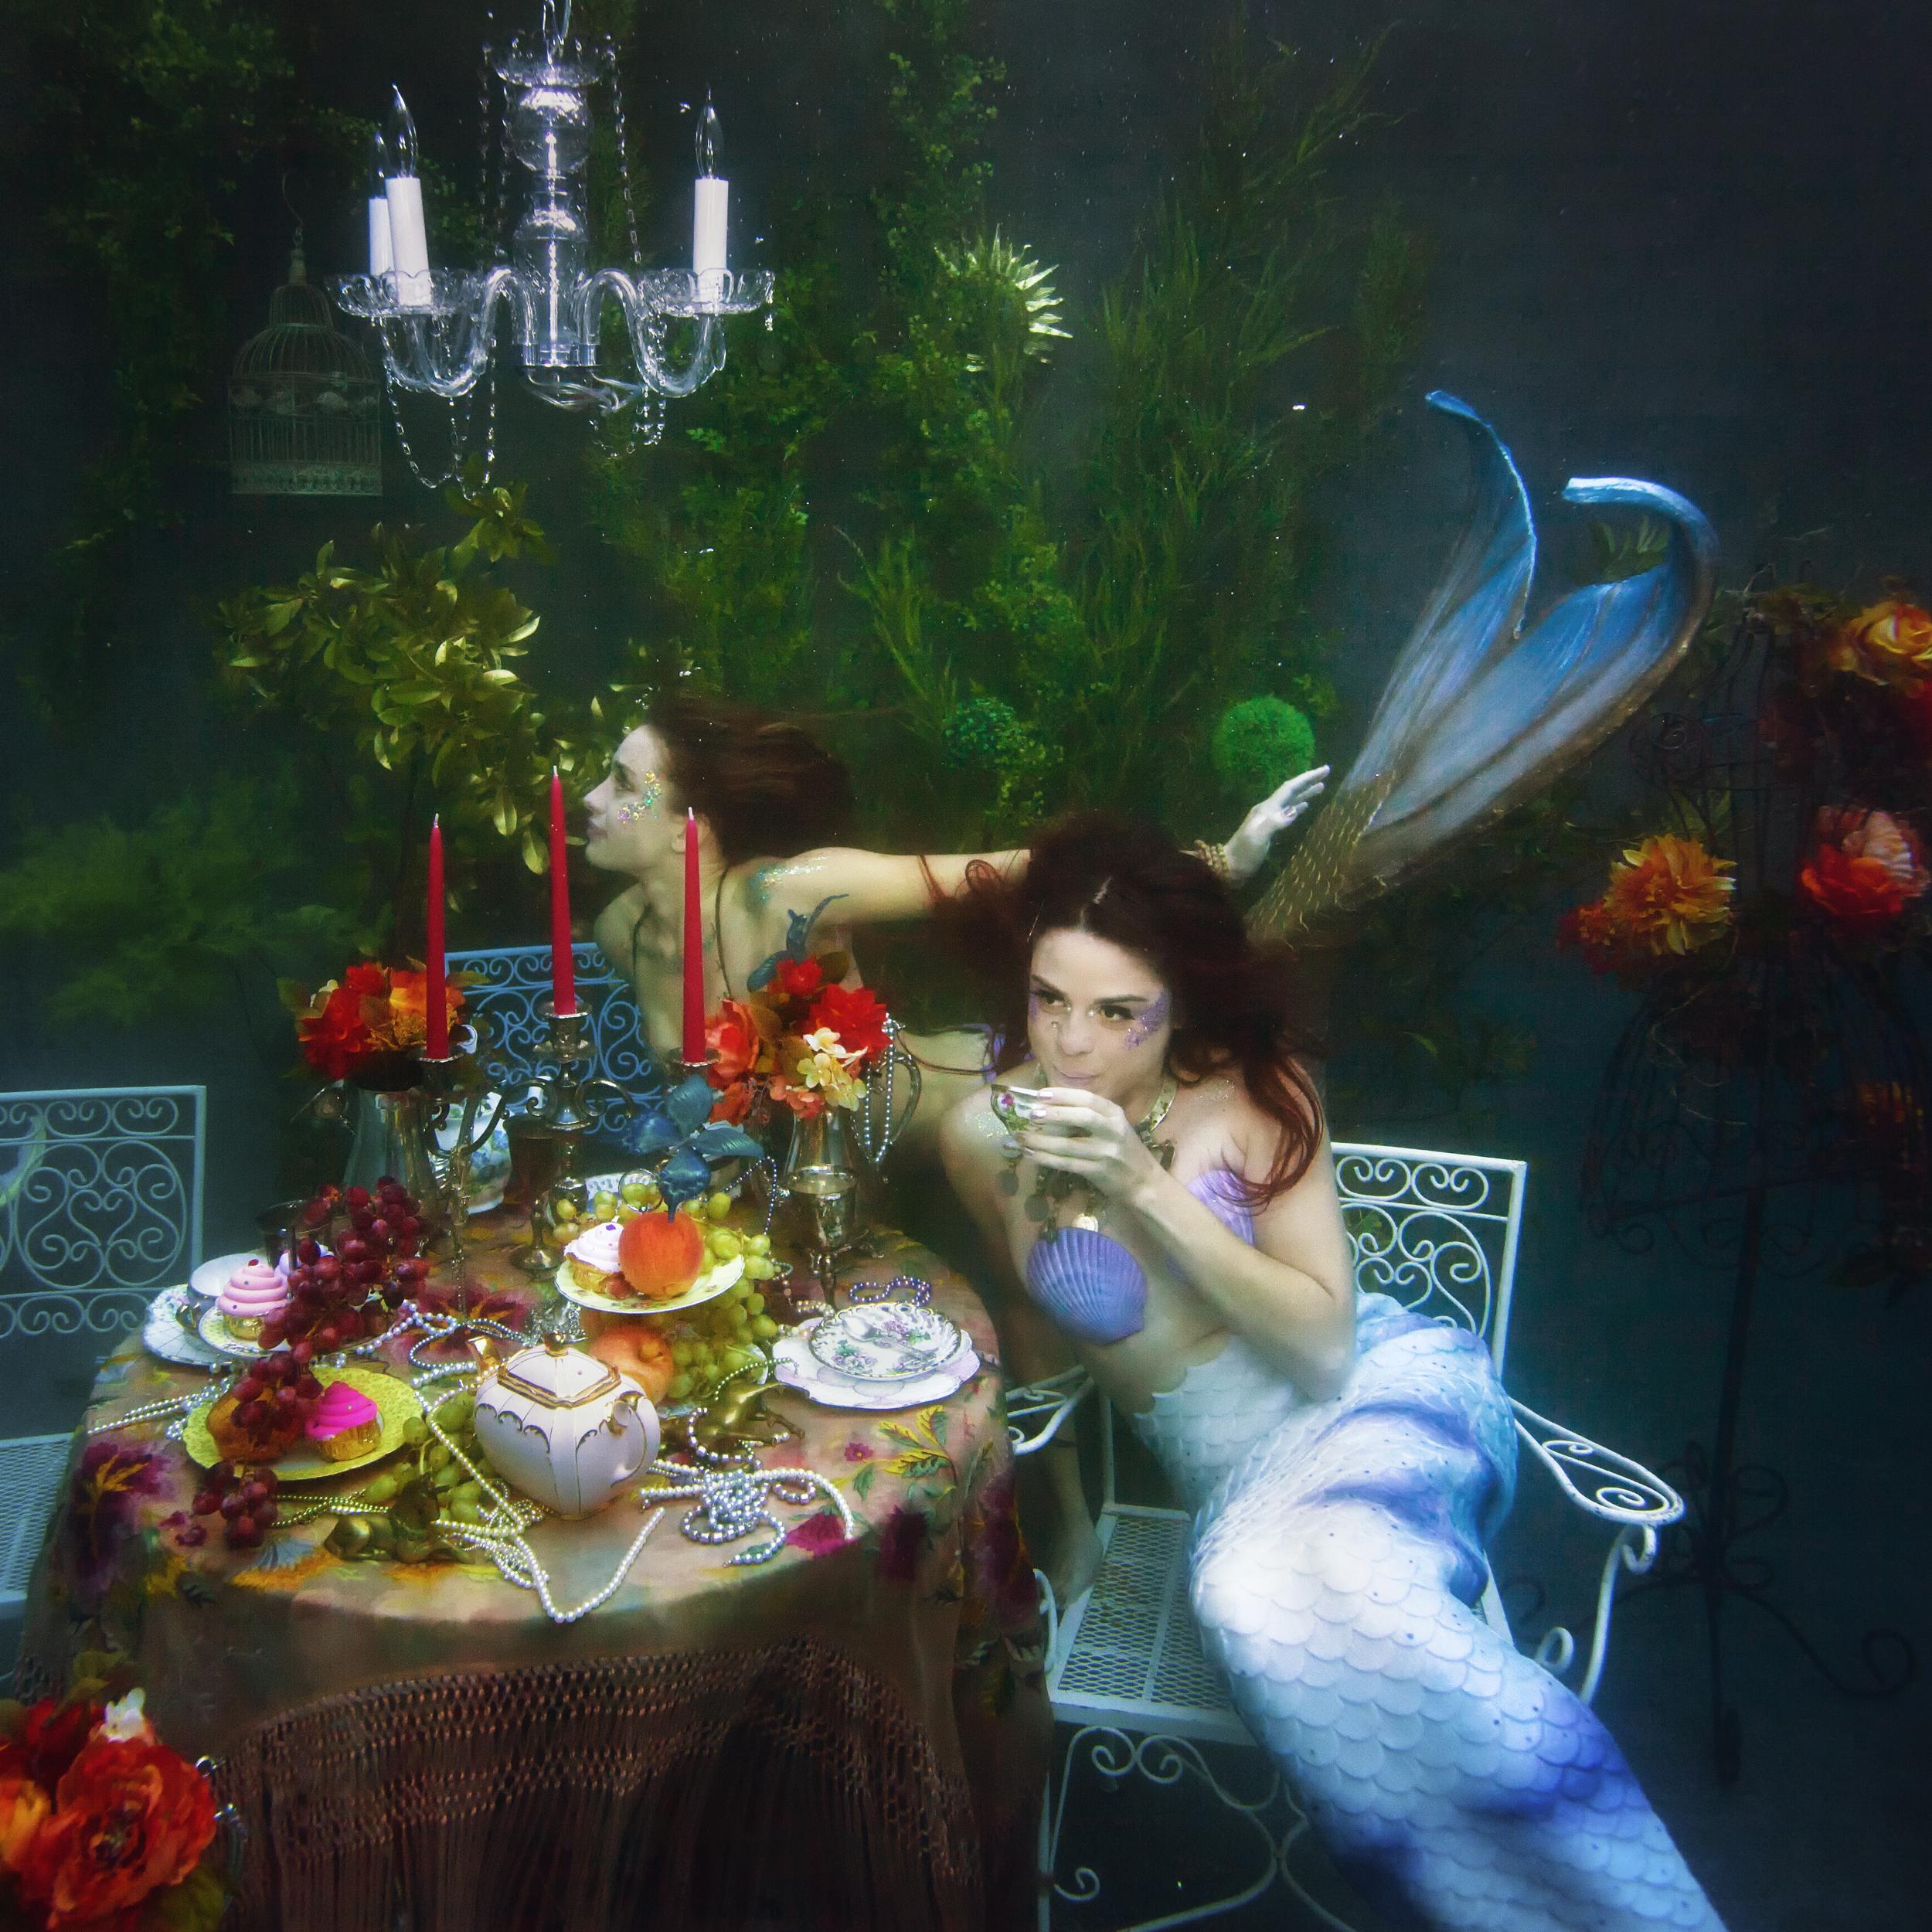 Mermaidteaparty6-3-(ZF-0463-12796-1-007).jpg